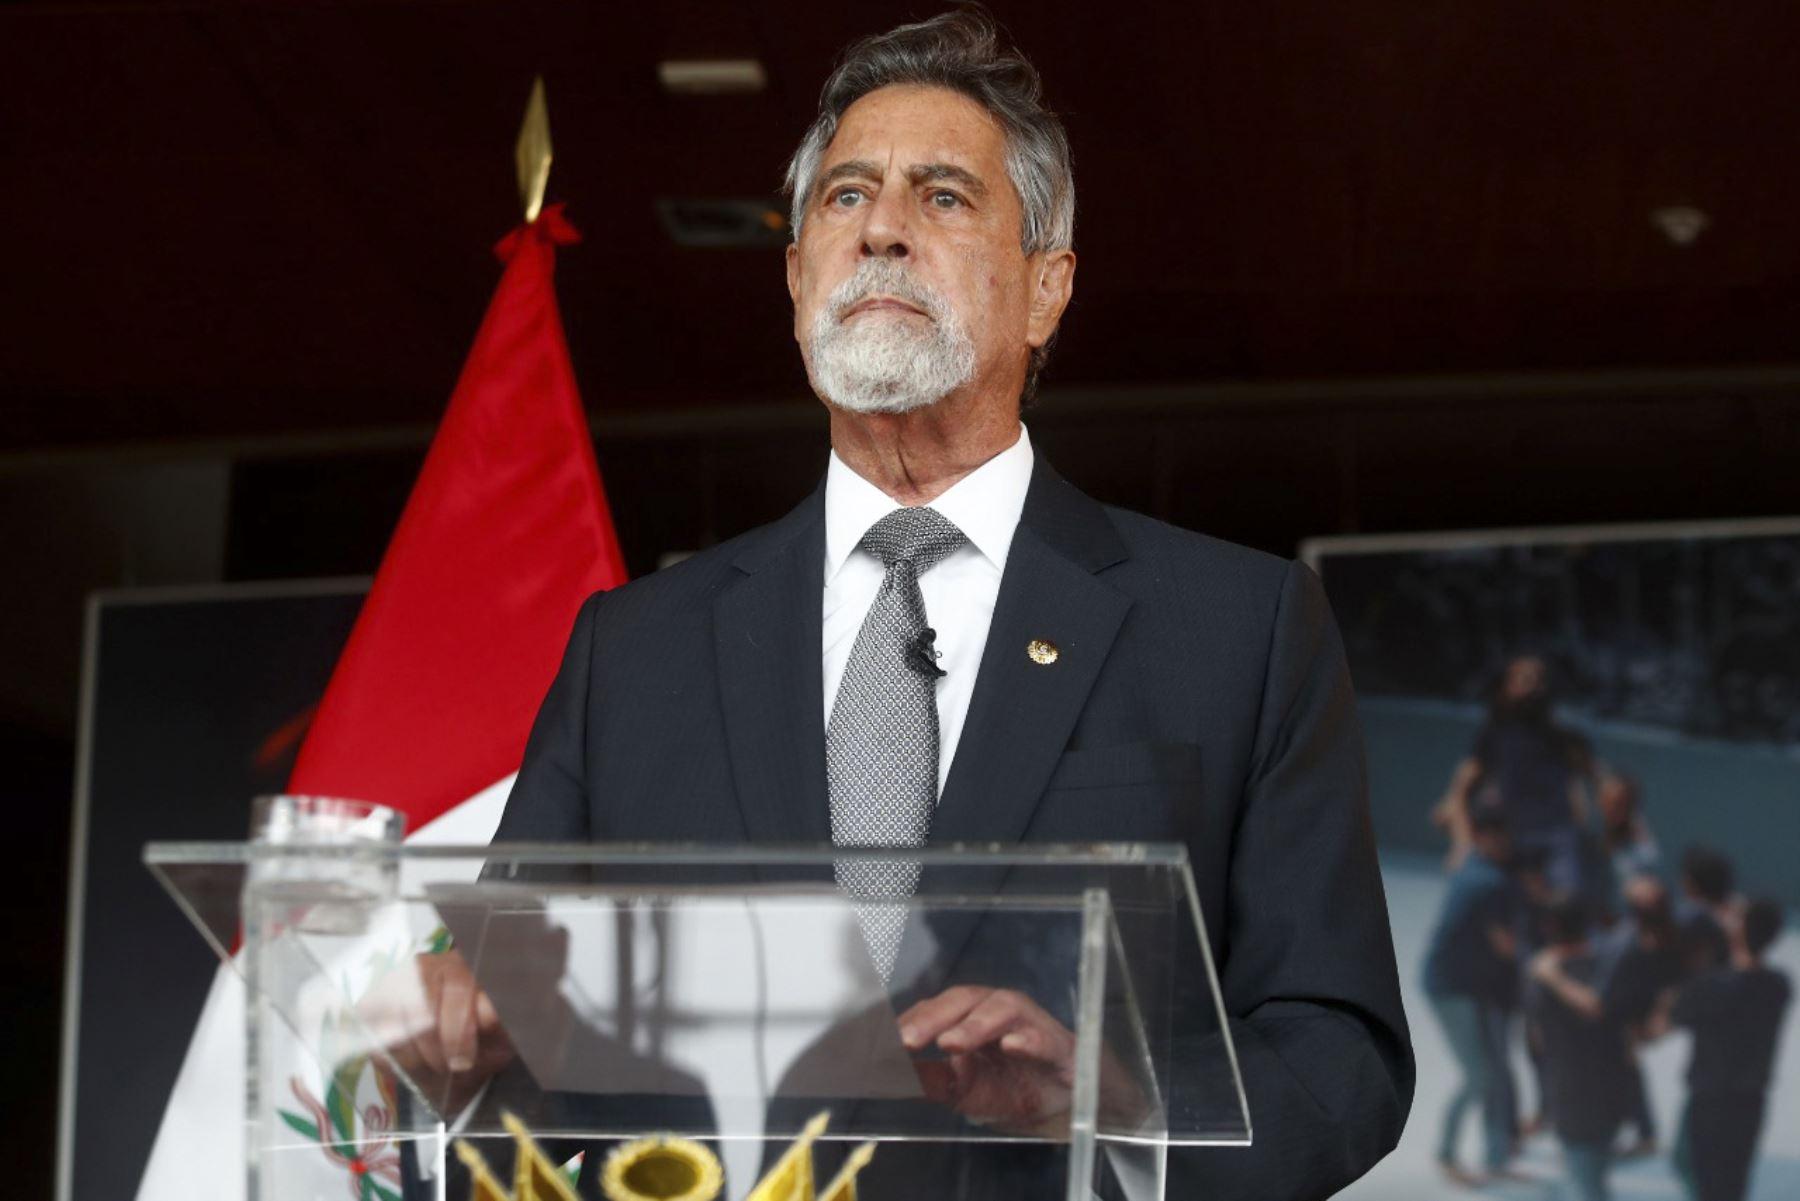 Pronunciamiento del presidente Francisco Sagasti. ANDINA/Prensa Presidencia